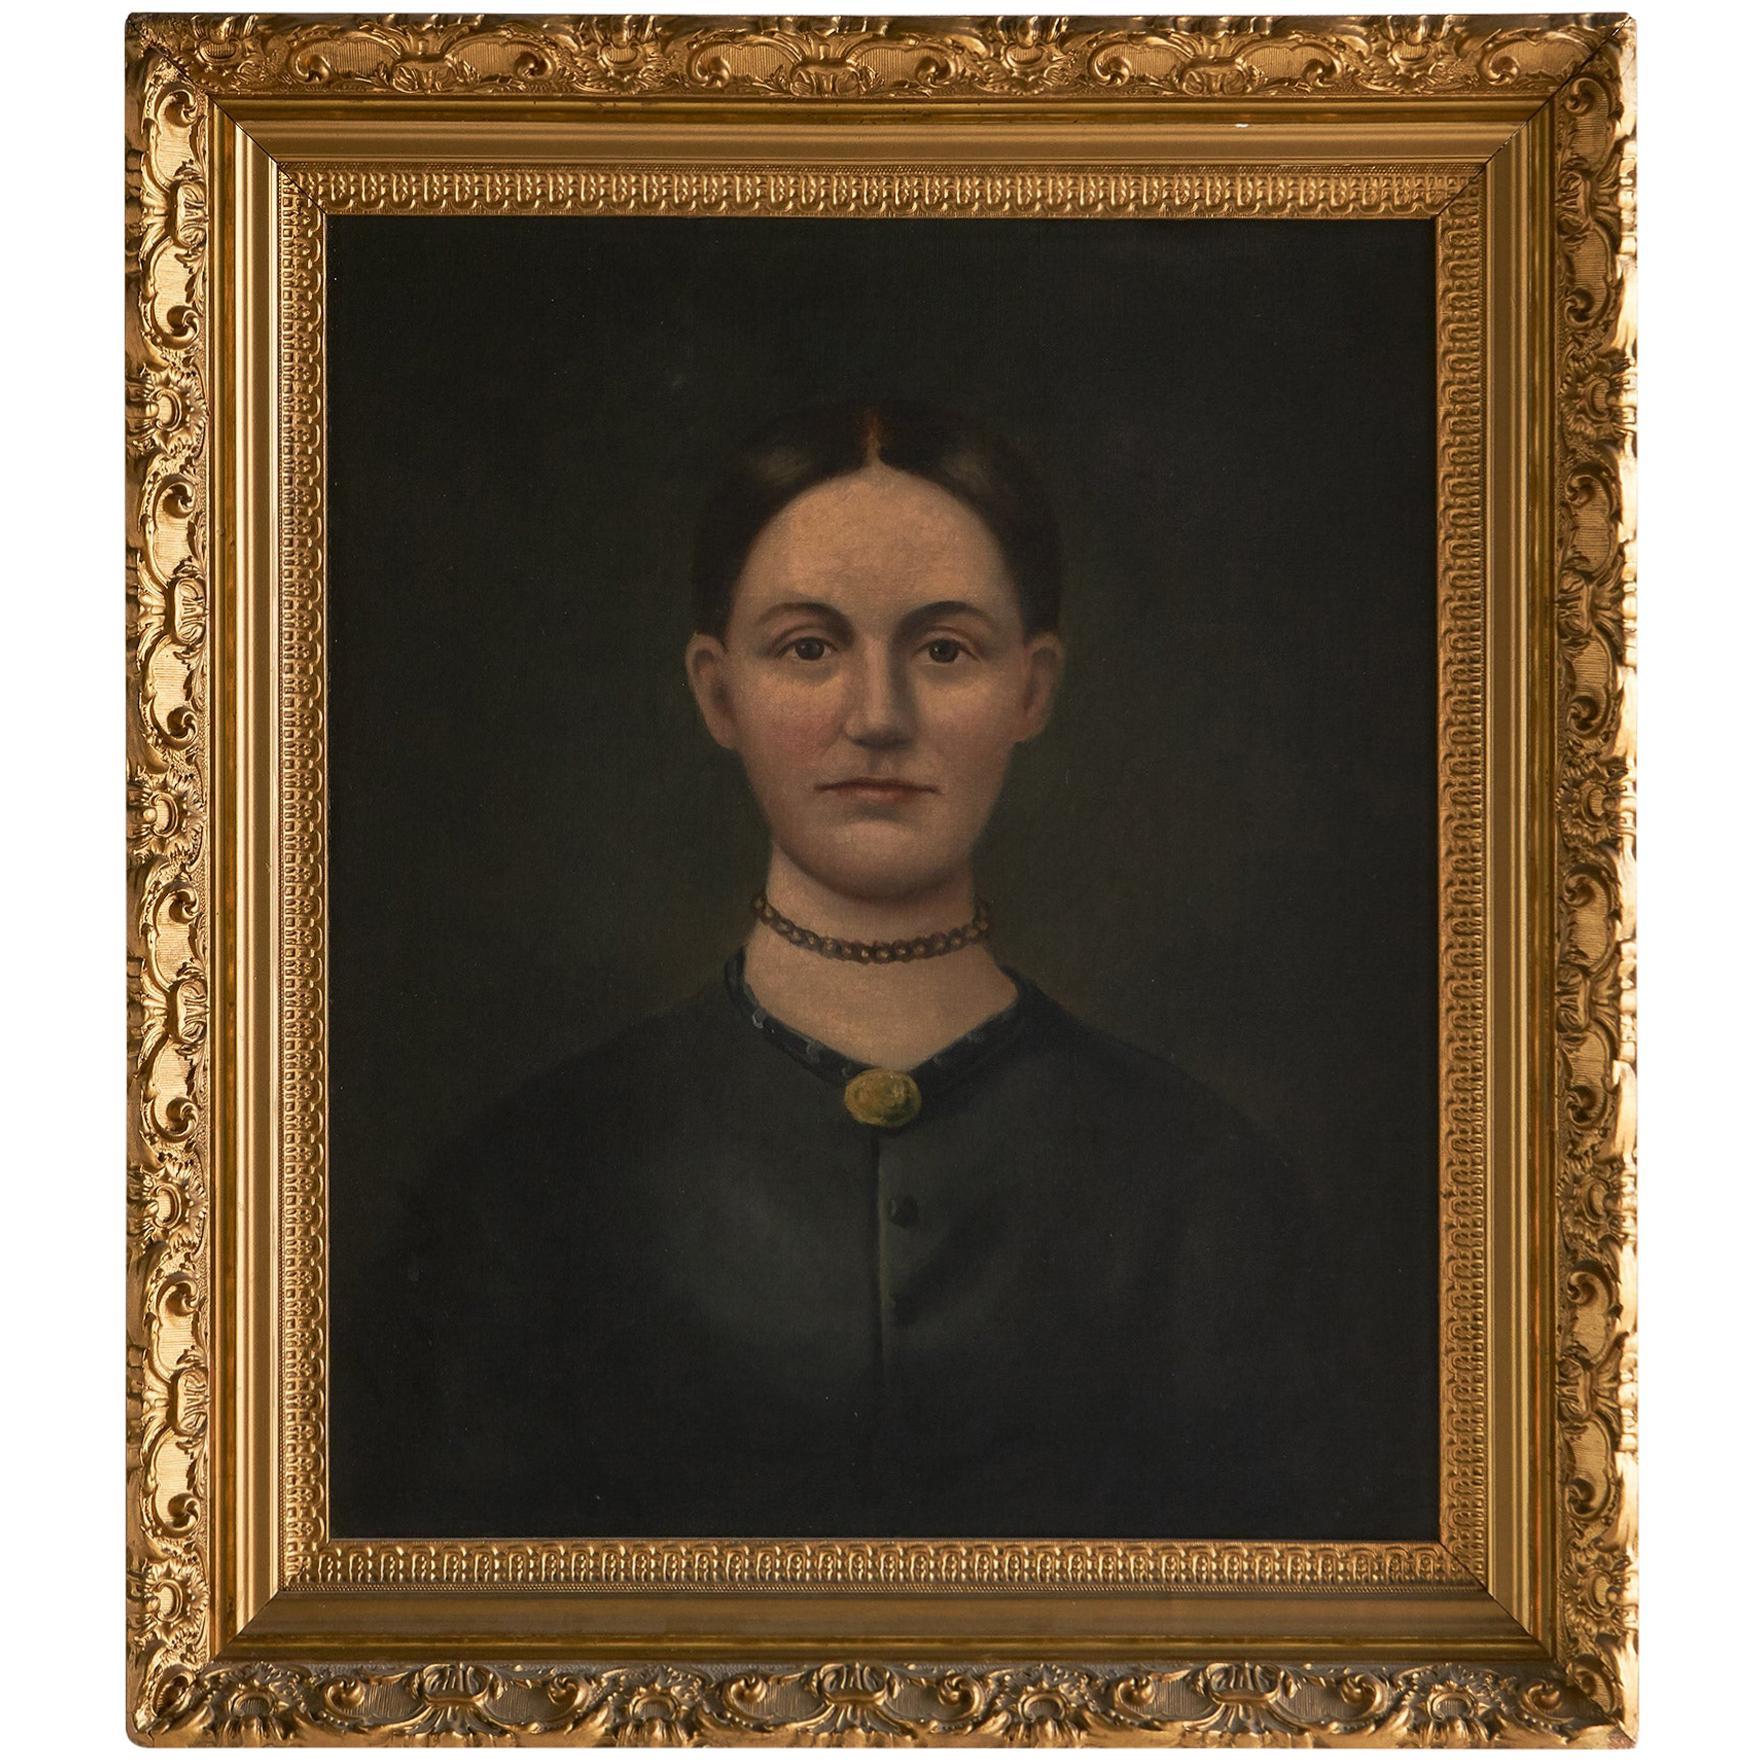 19th Century Female Oil Painting in Gilt Frame